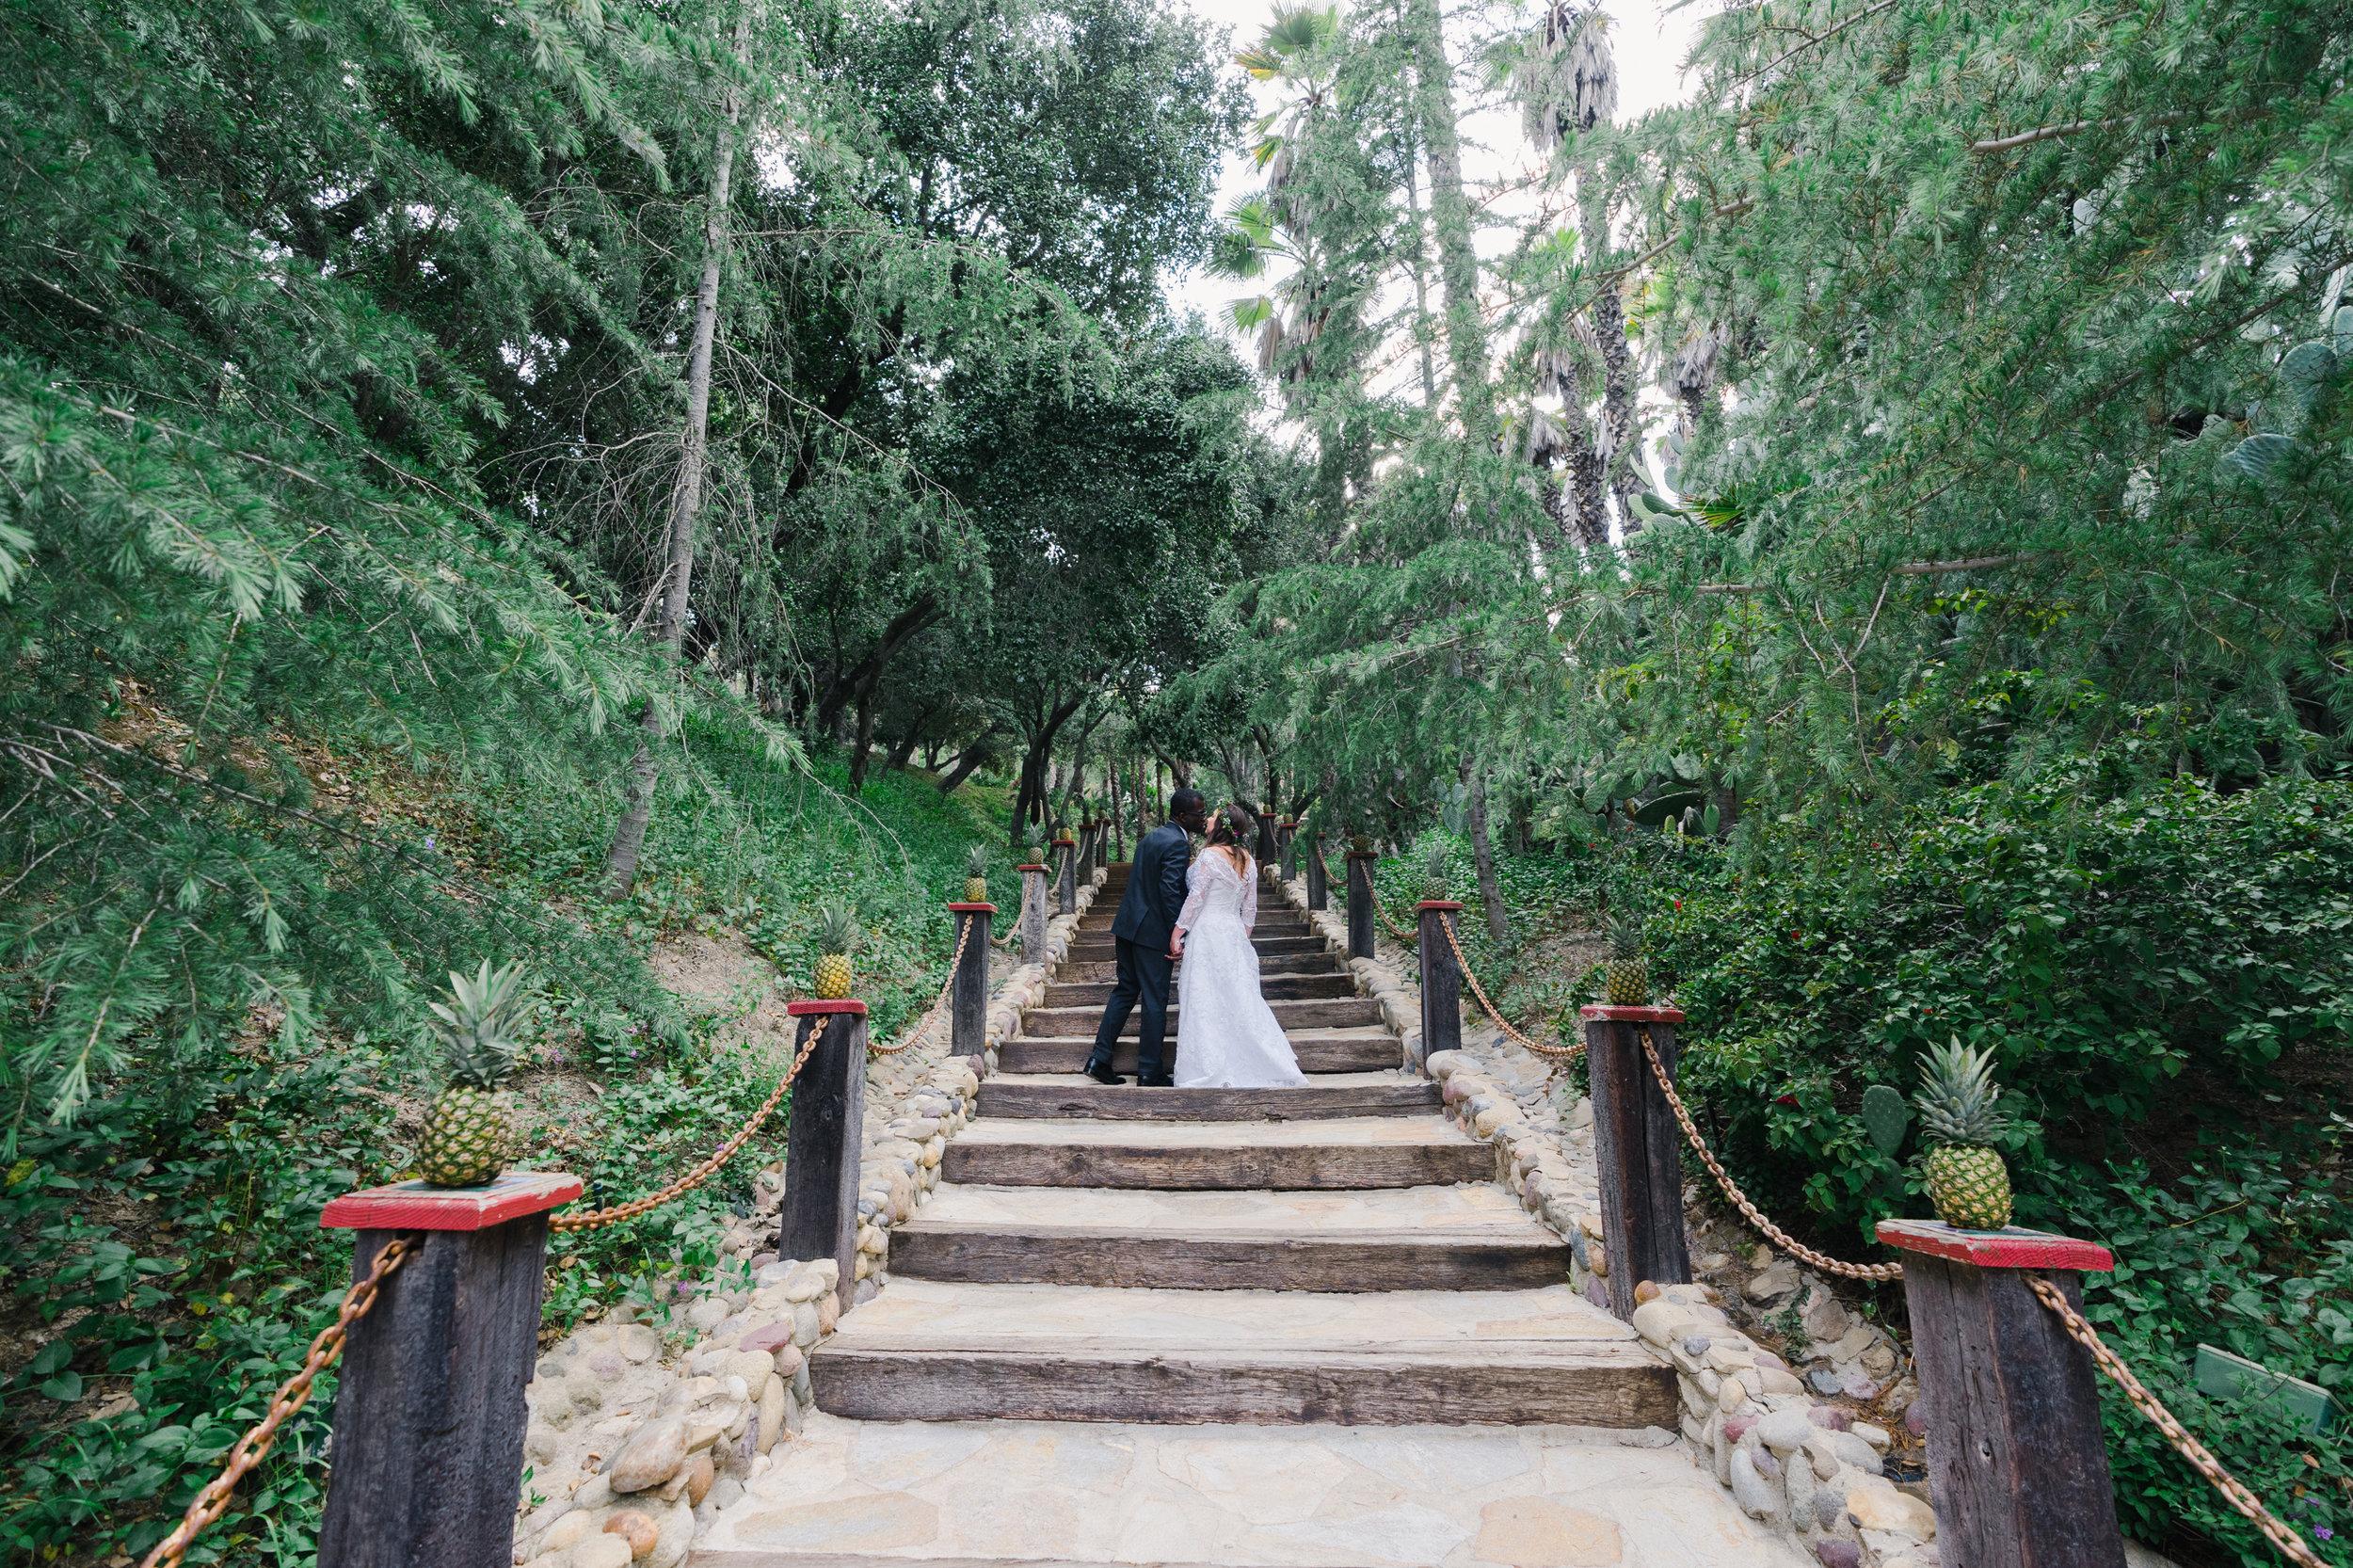 rancho-las-lomas-wedding-kelsey-sim_0154.JPG